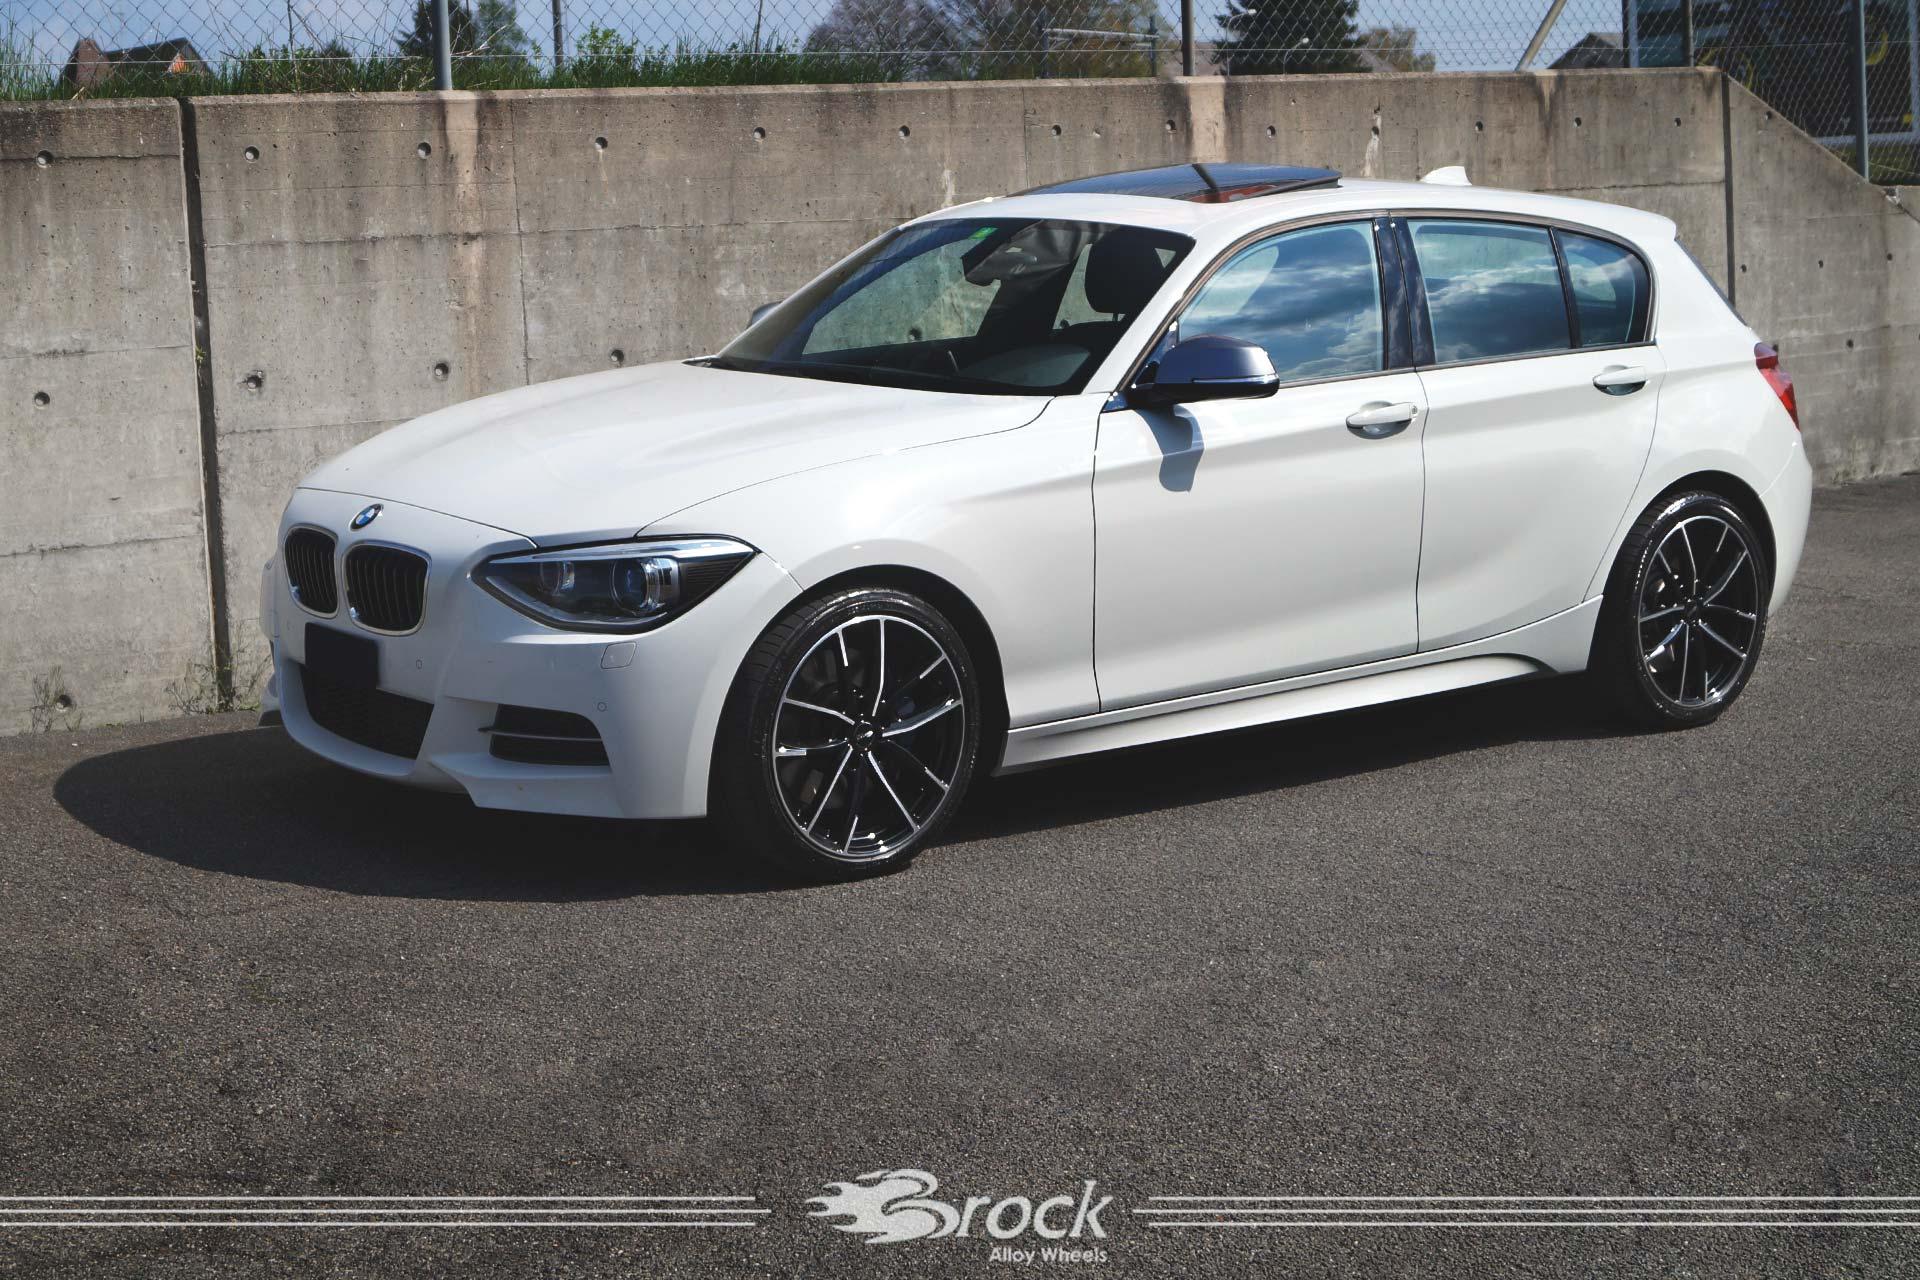 BMW M135i Brock B38 SGVP